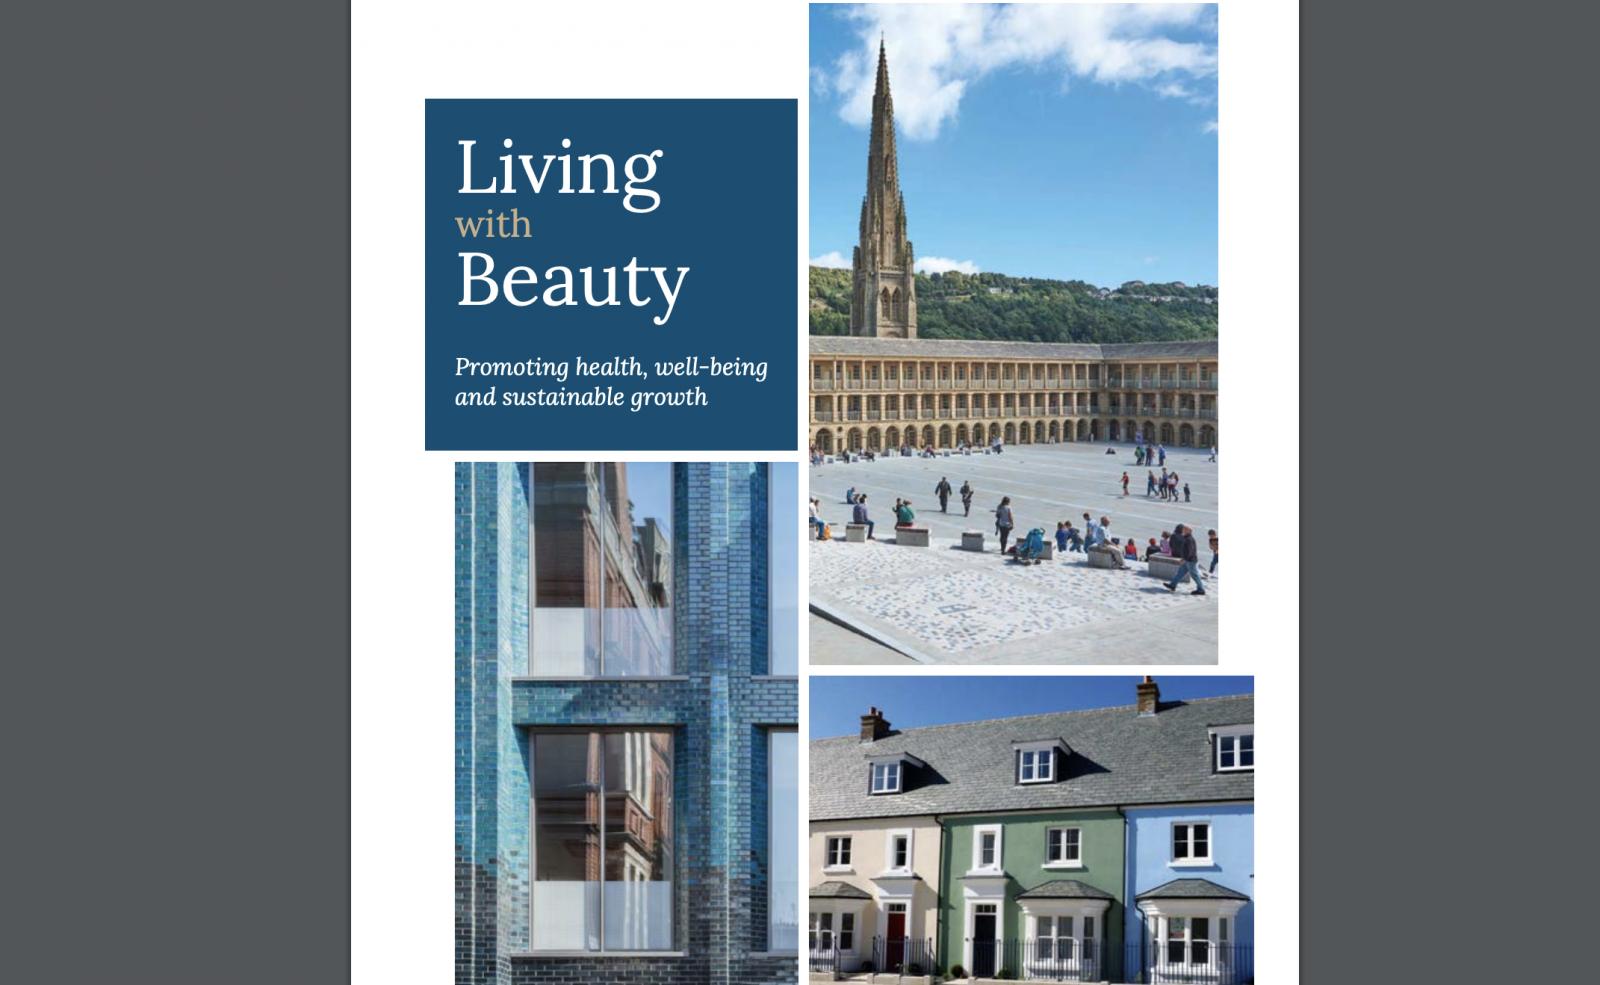 Build Beautiful report